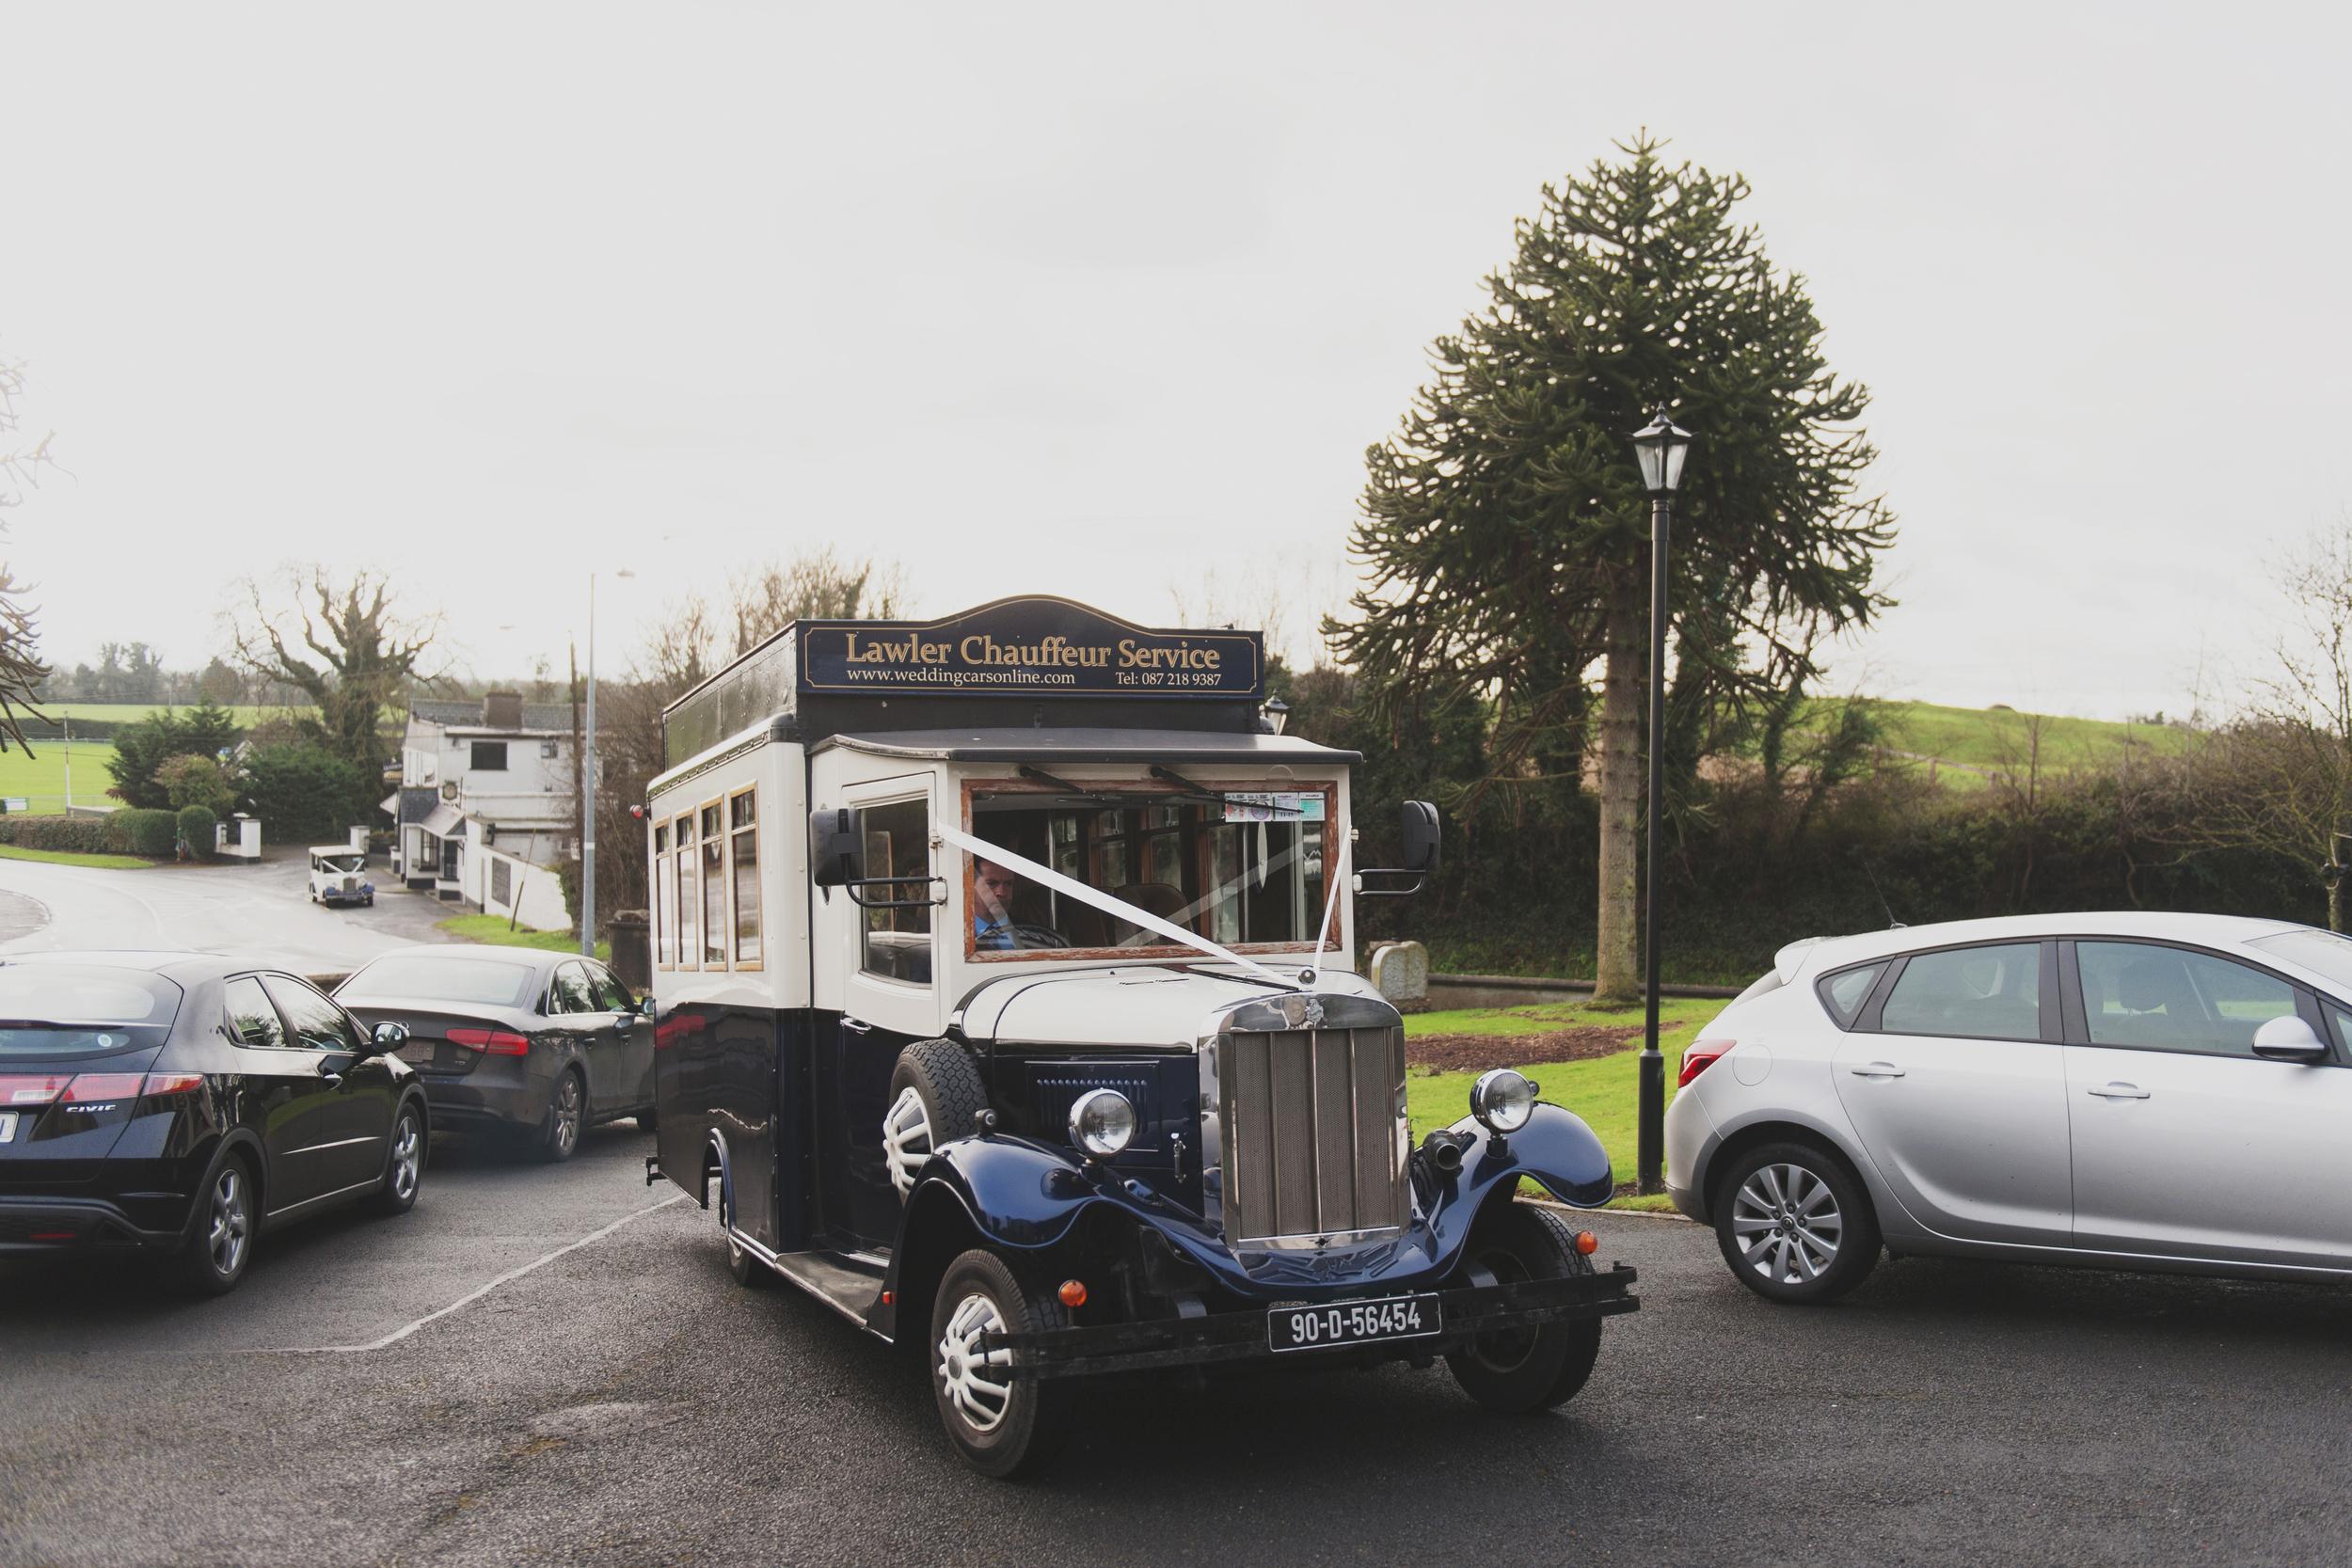 Carton_House_Wedding_Photography_Maynooth_Ireland_034.jpg